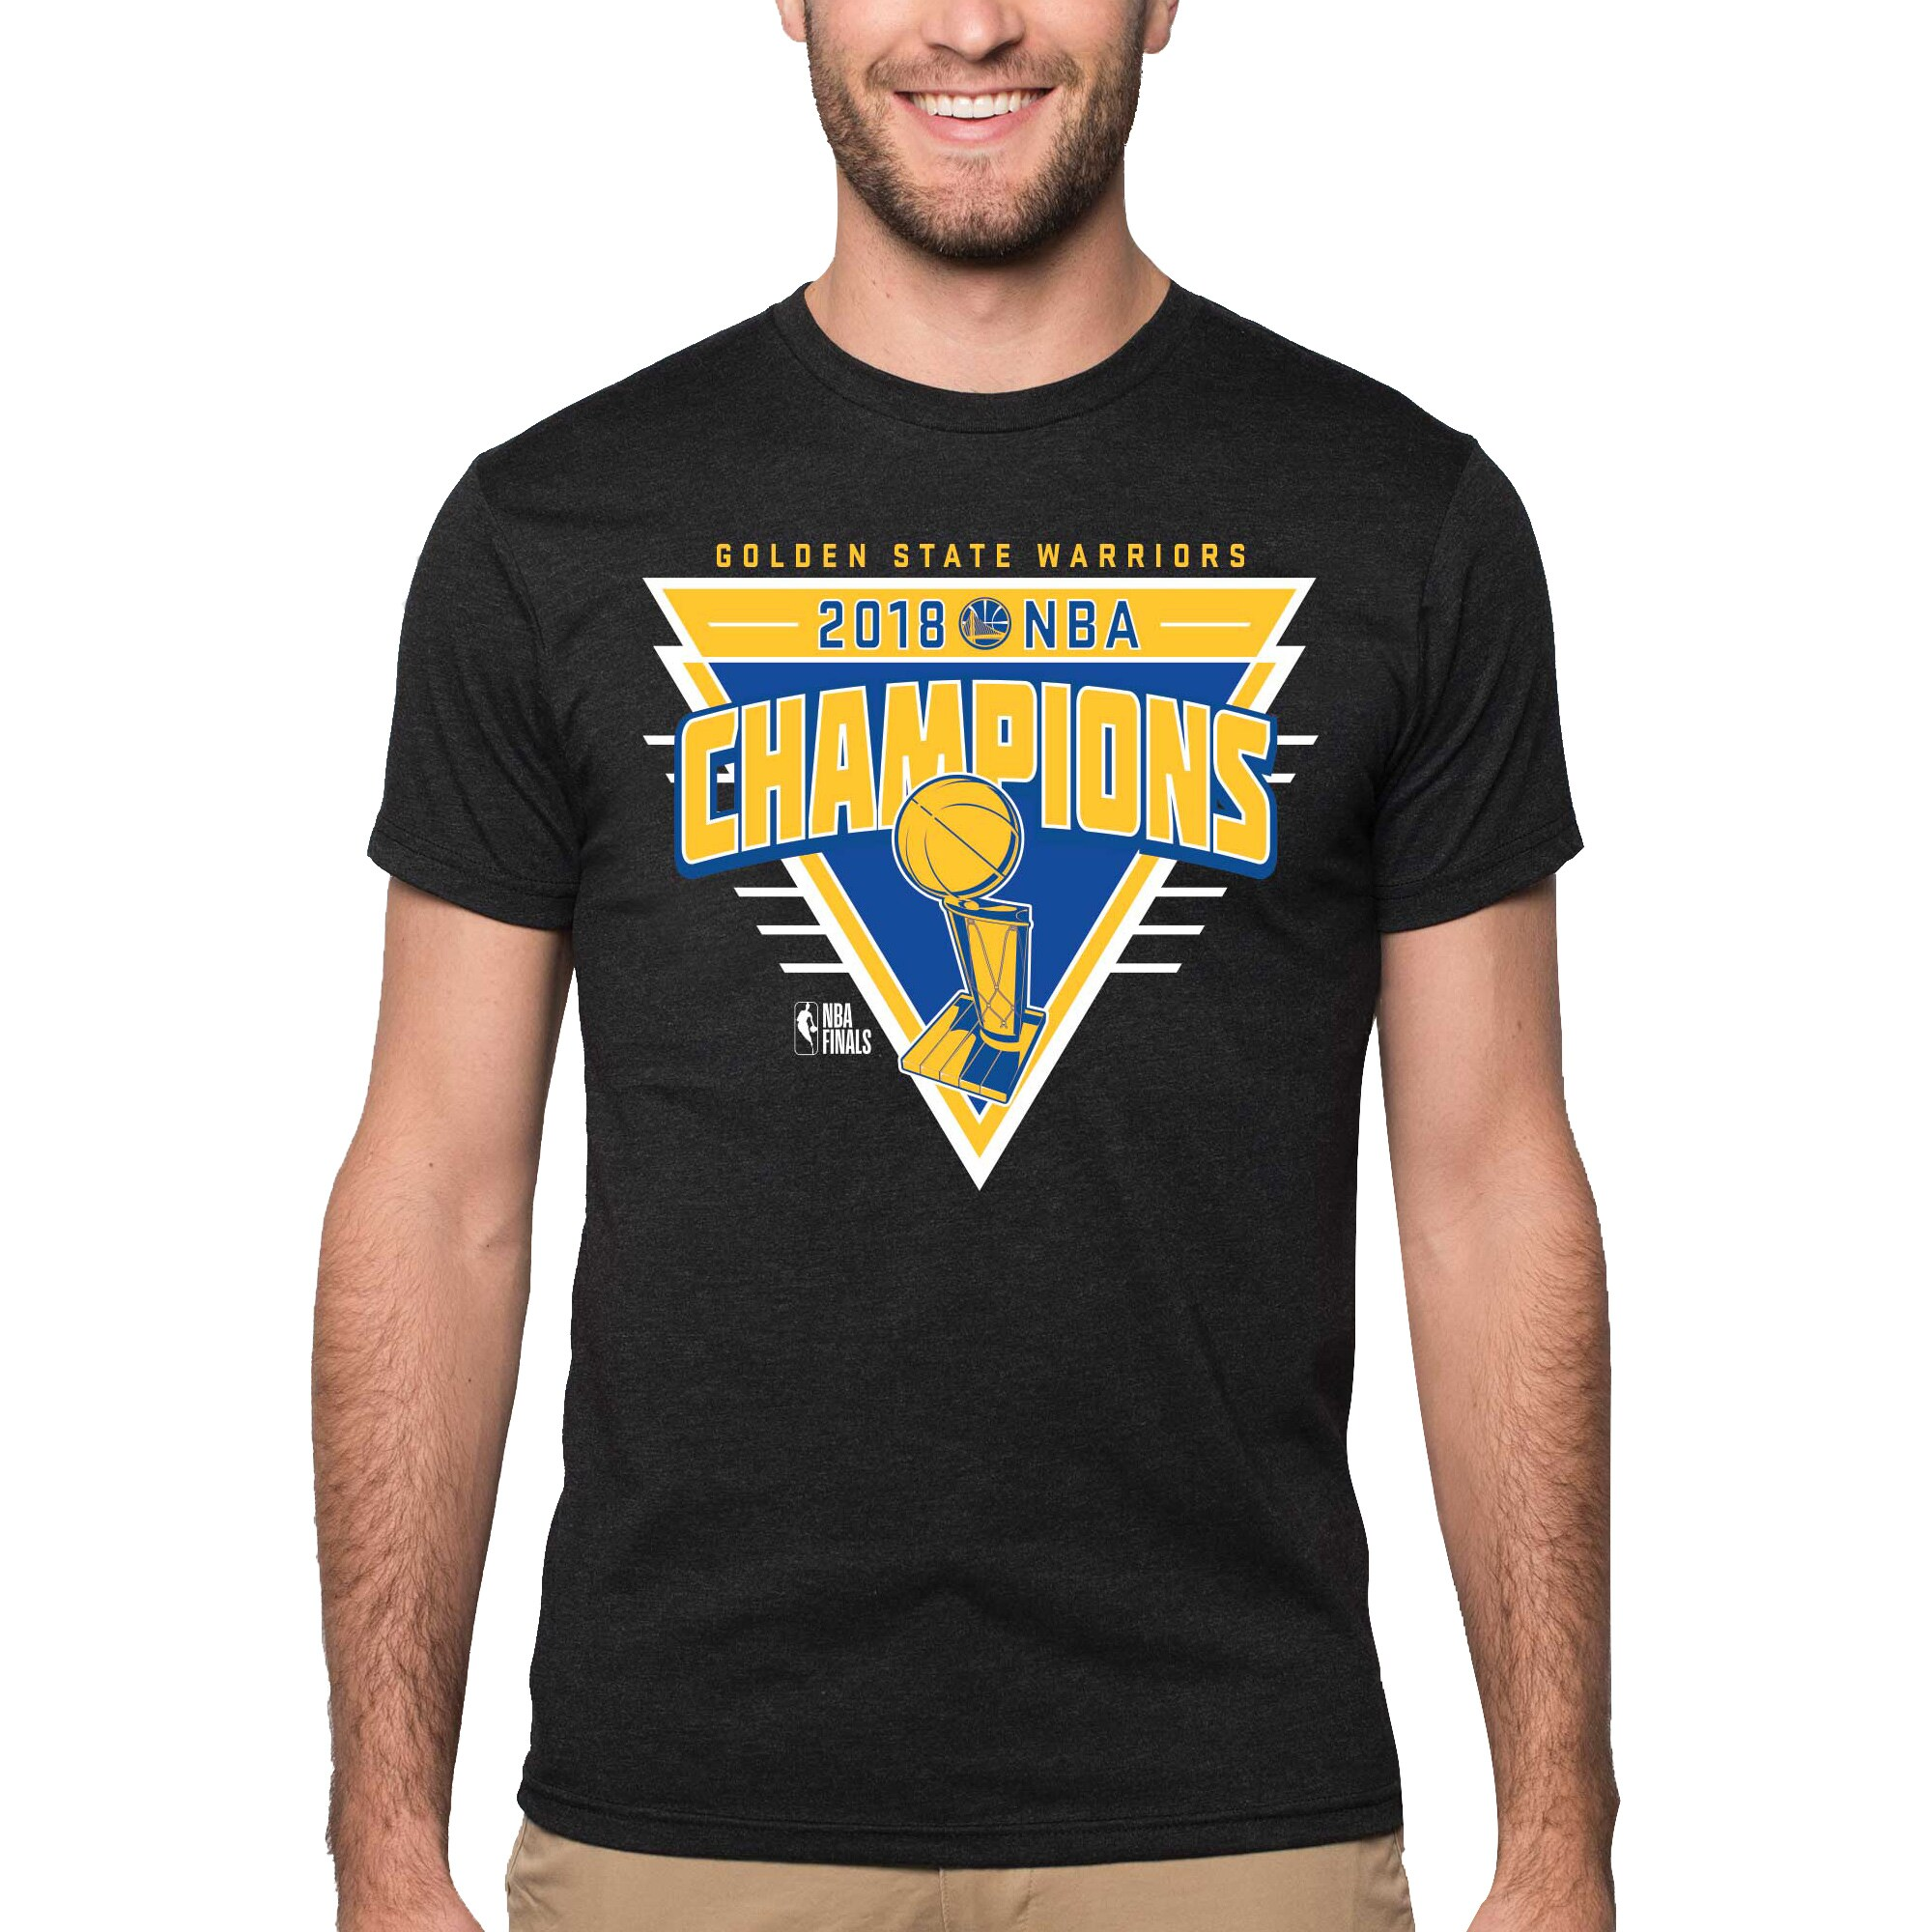 Golden State Warriors Sportiqe 2018 NBA Finals Champions Retro Supersoft Comfy Tri-Blend T-Shirt - Black